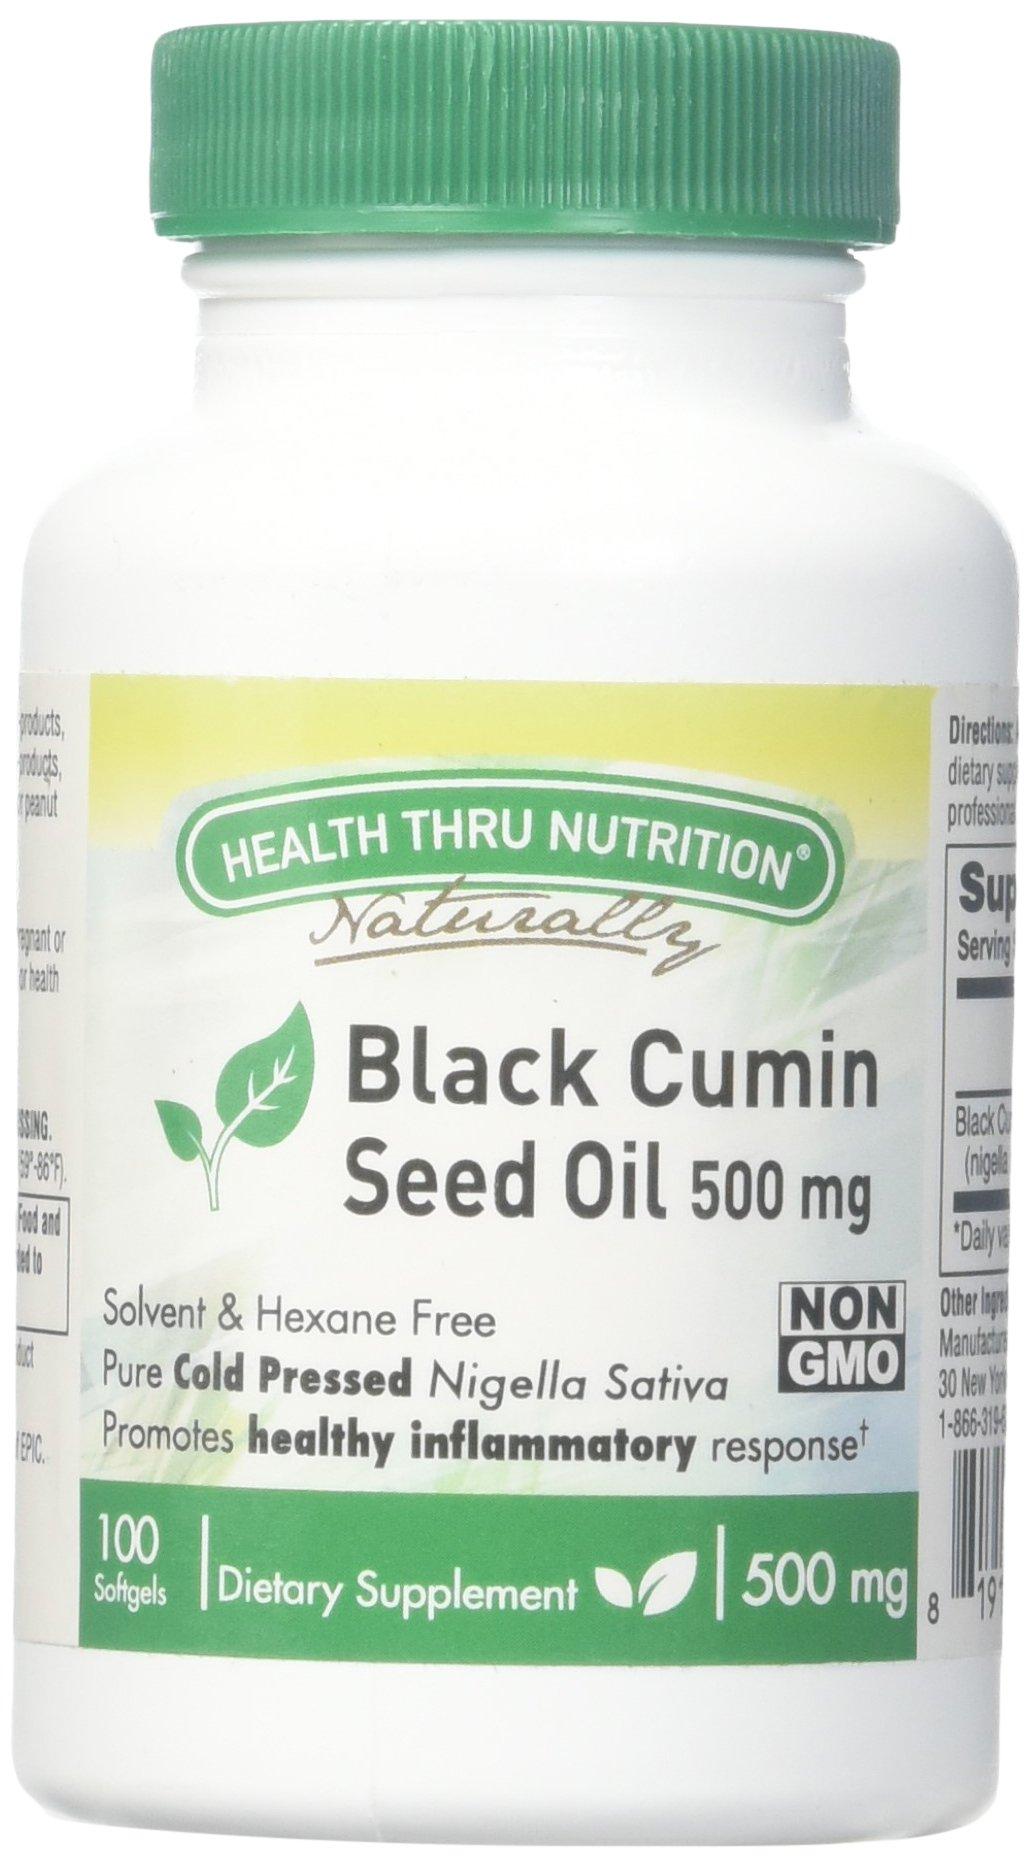 Organic Peru Black Maca Root Tablets 1000 Milligram Per Ever E Isi 30 Softgels Health Thru Nutrition Cumin Seed Oil Non Gmo 500mg First Cold Pressed